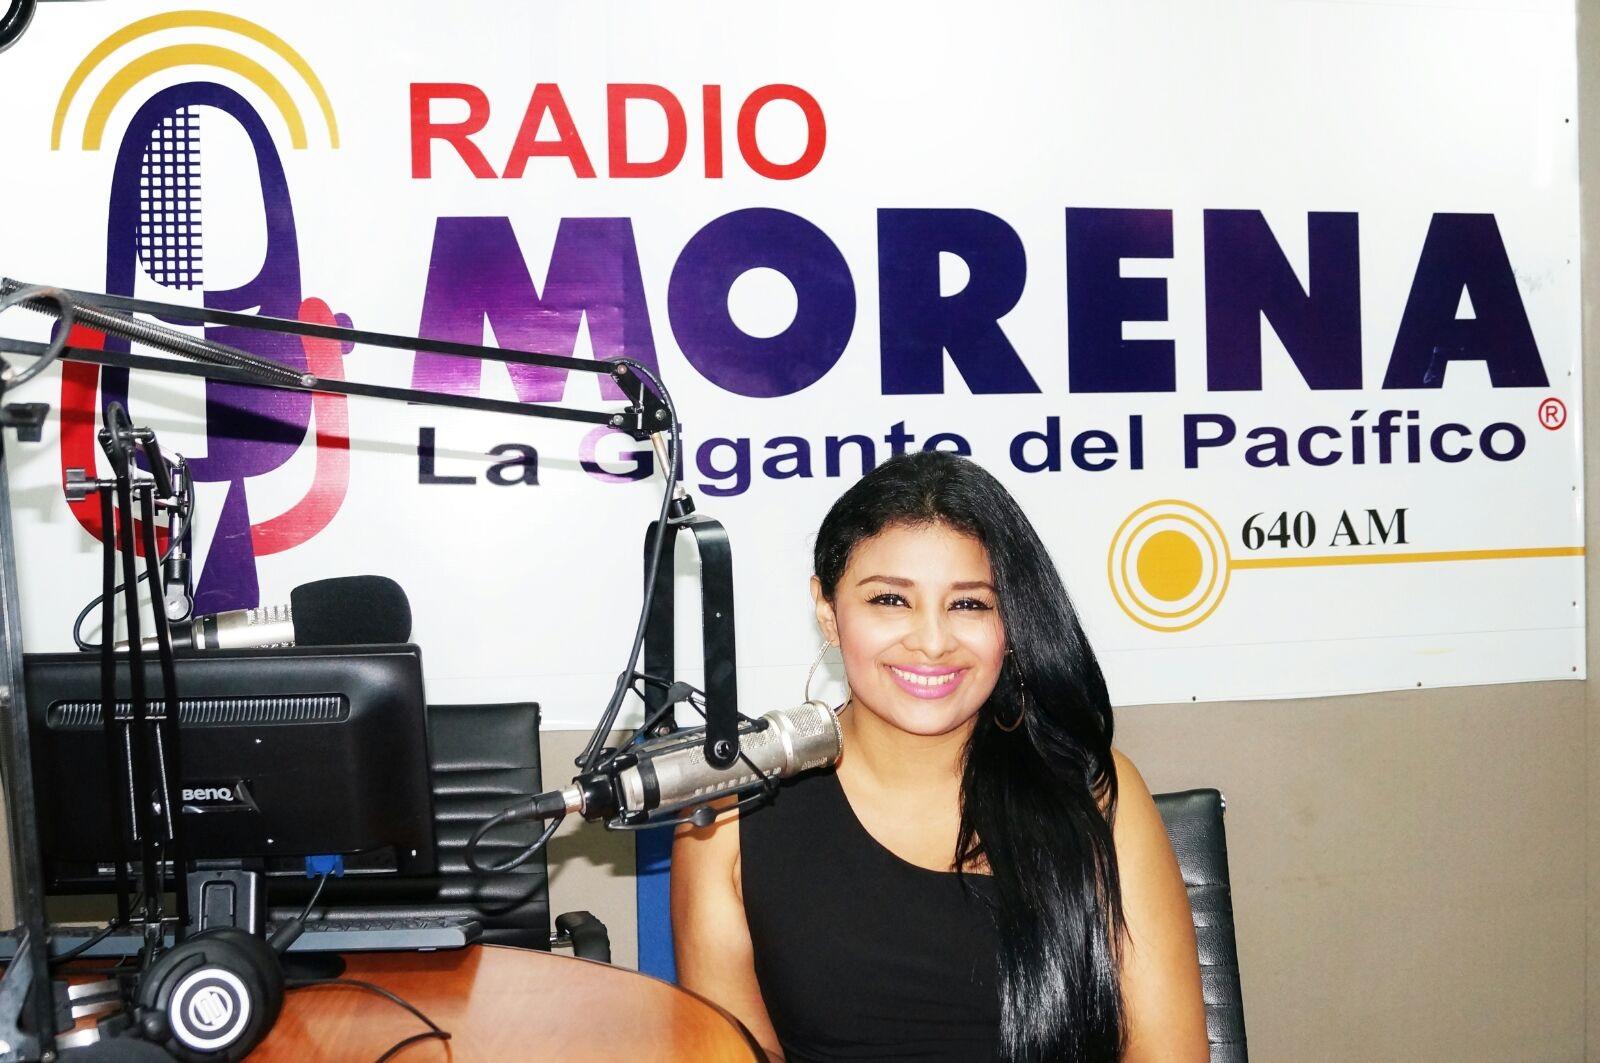 Sra. Diana Díaz, Coordinadora de Morena Noticias